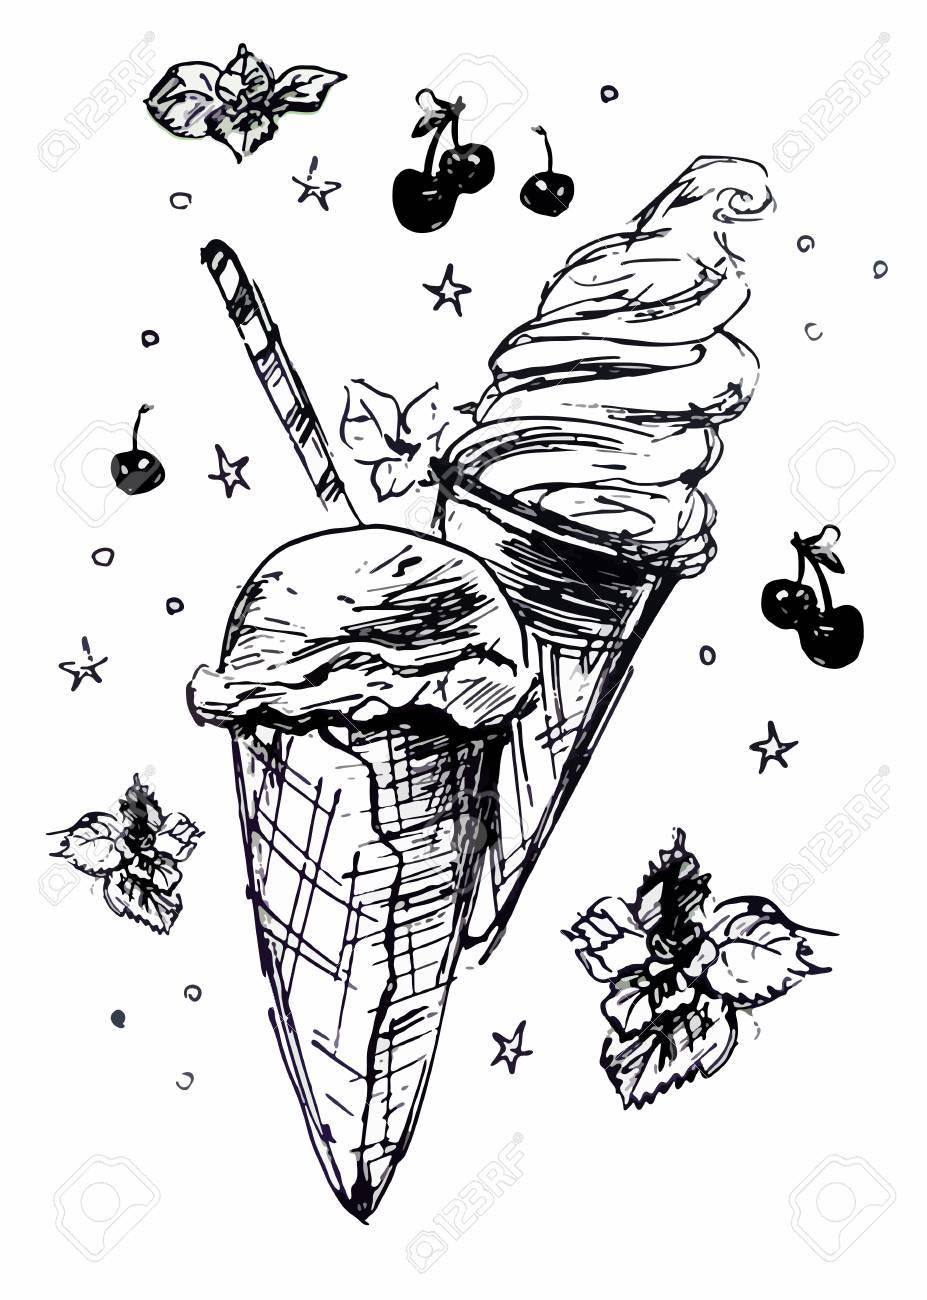 Ice Cream With Decoration Line Drawing Lizenzfrei Nutzbare